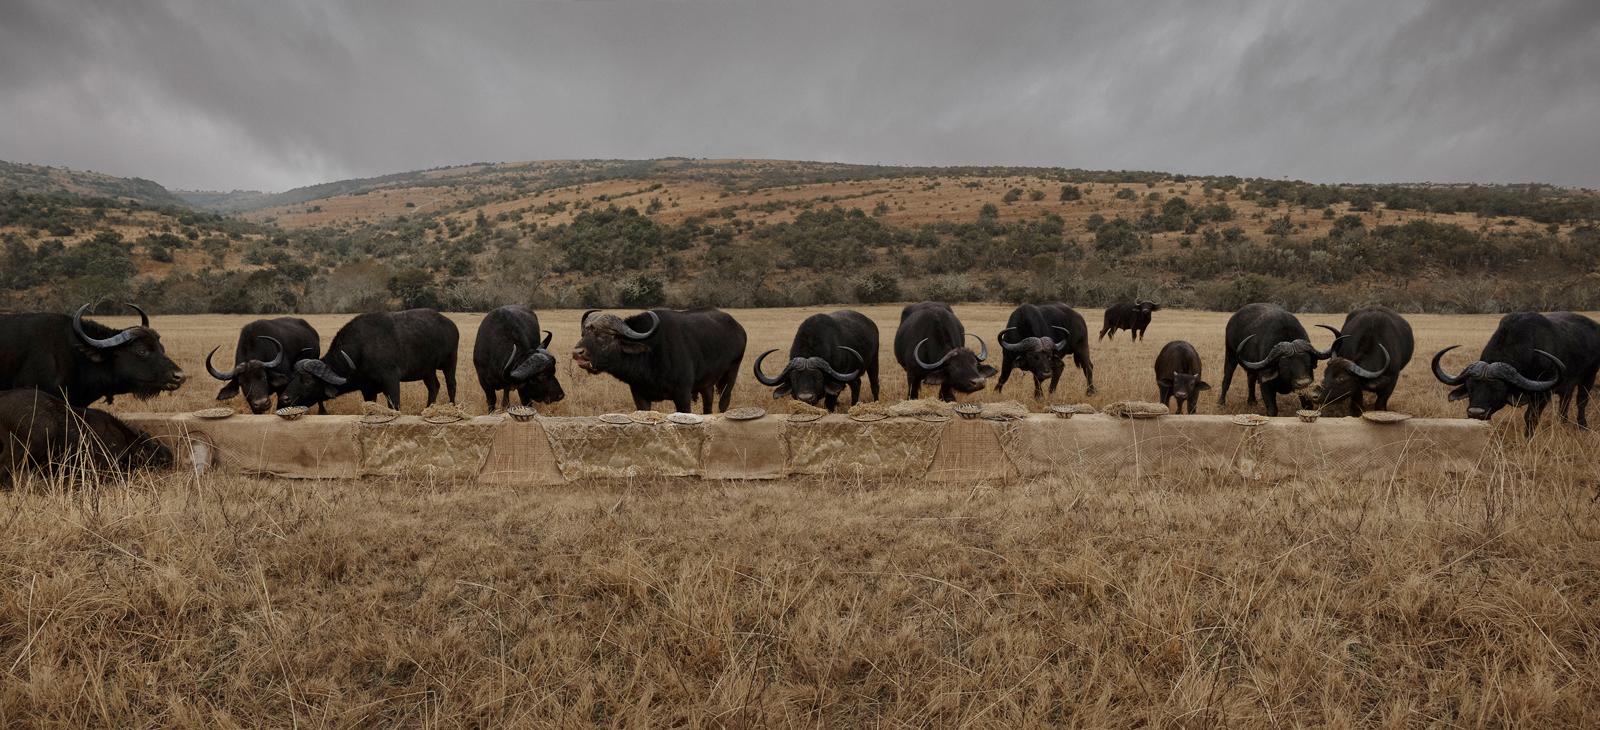 "The Water Buffalo Feast  South Africa, 2016  10""x22"" | 20""x44"" | 40""x88"""